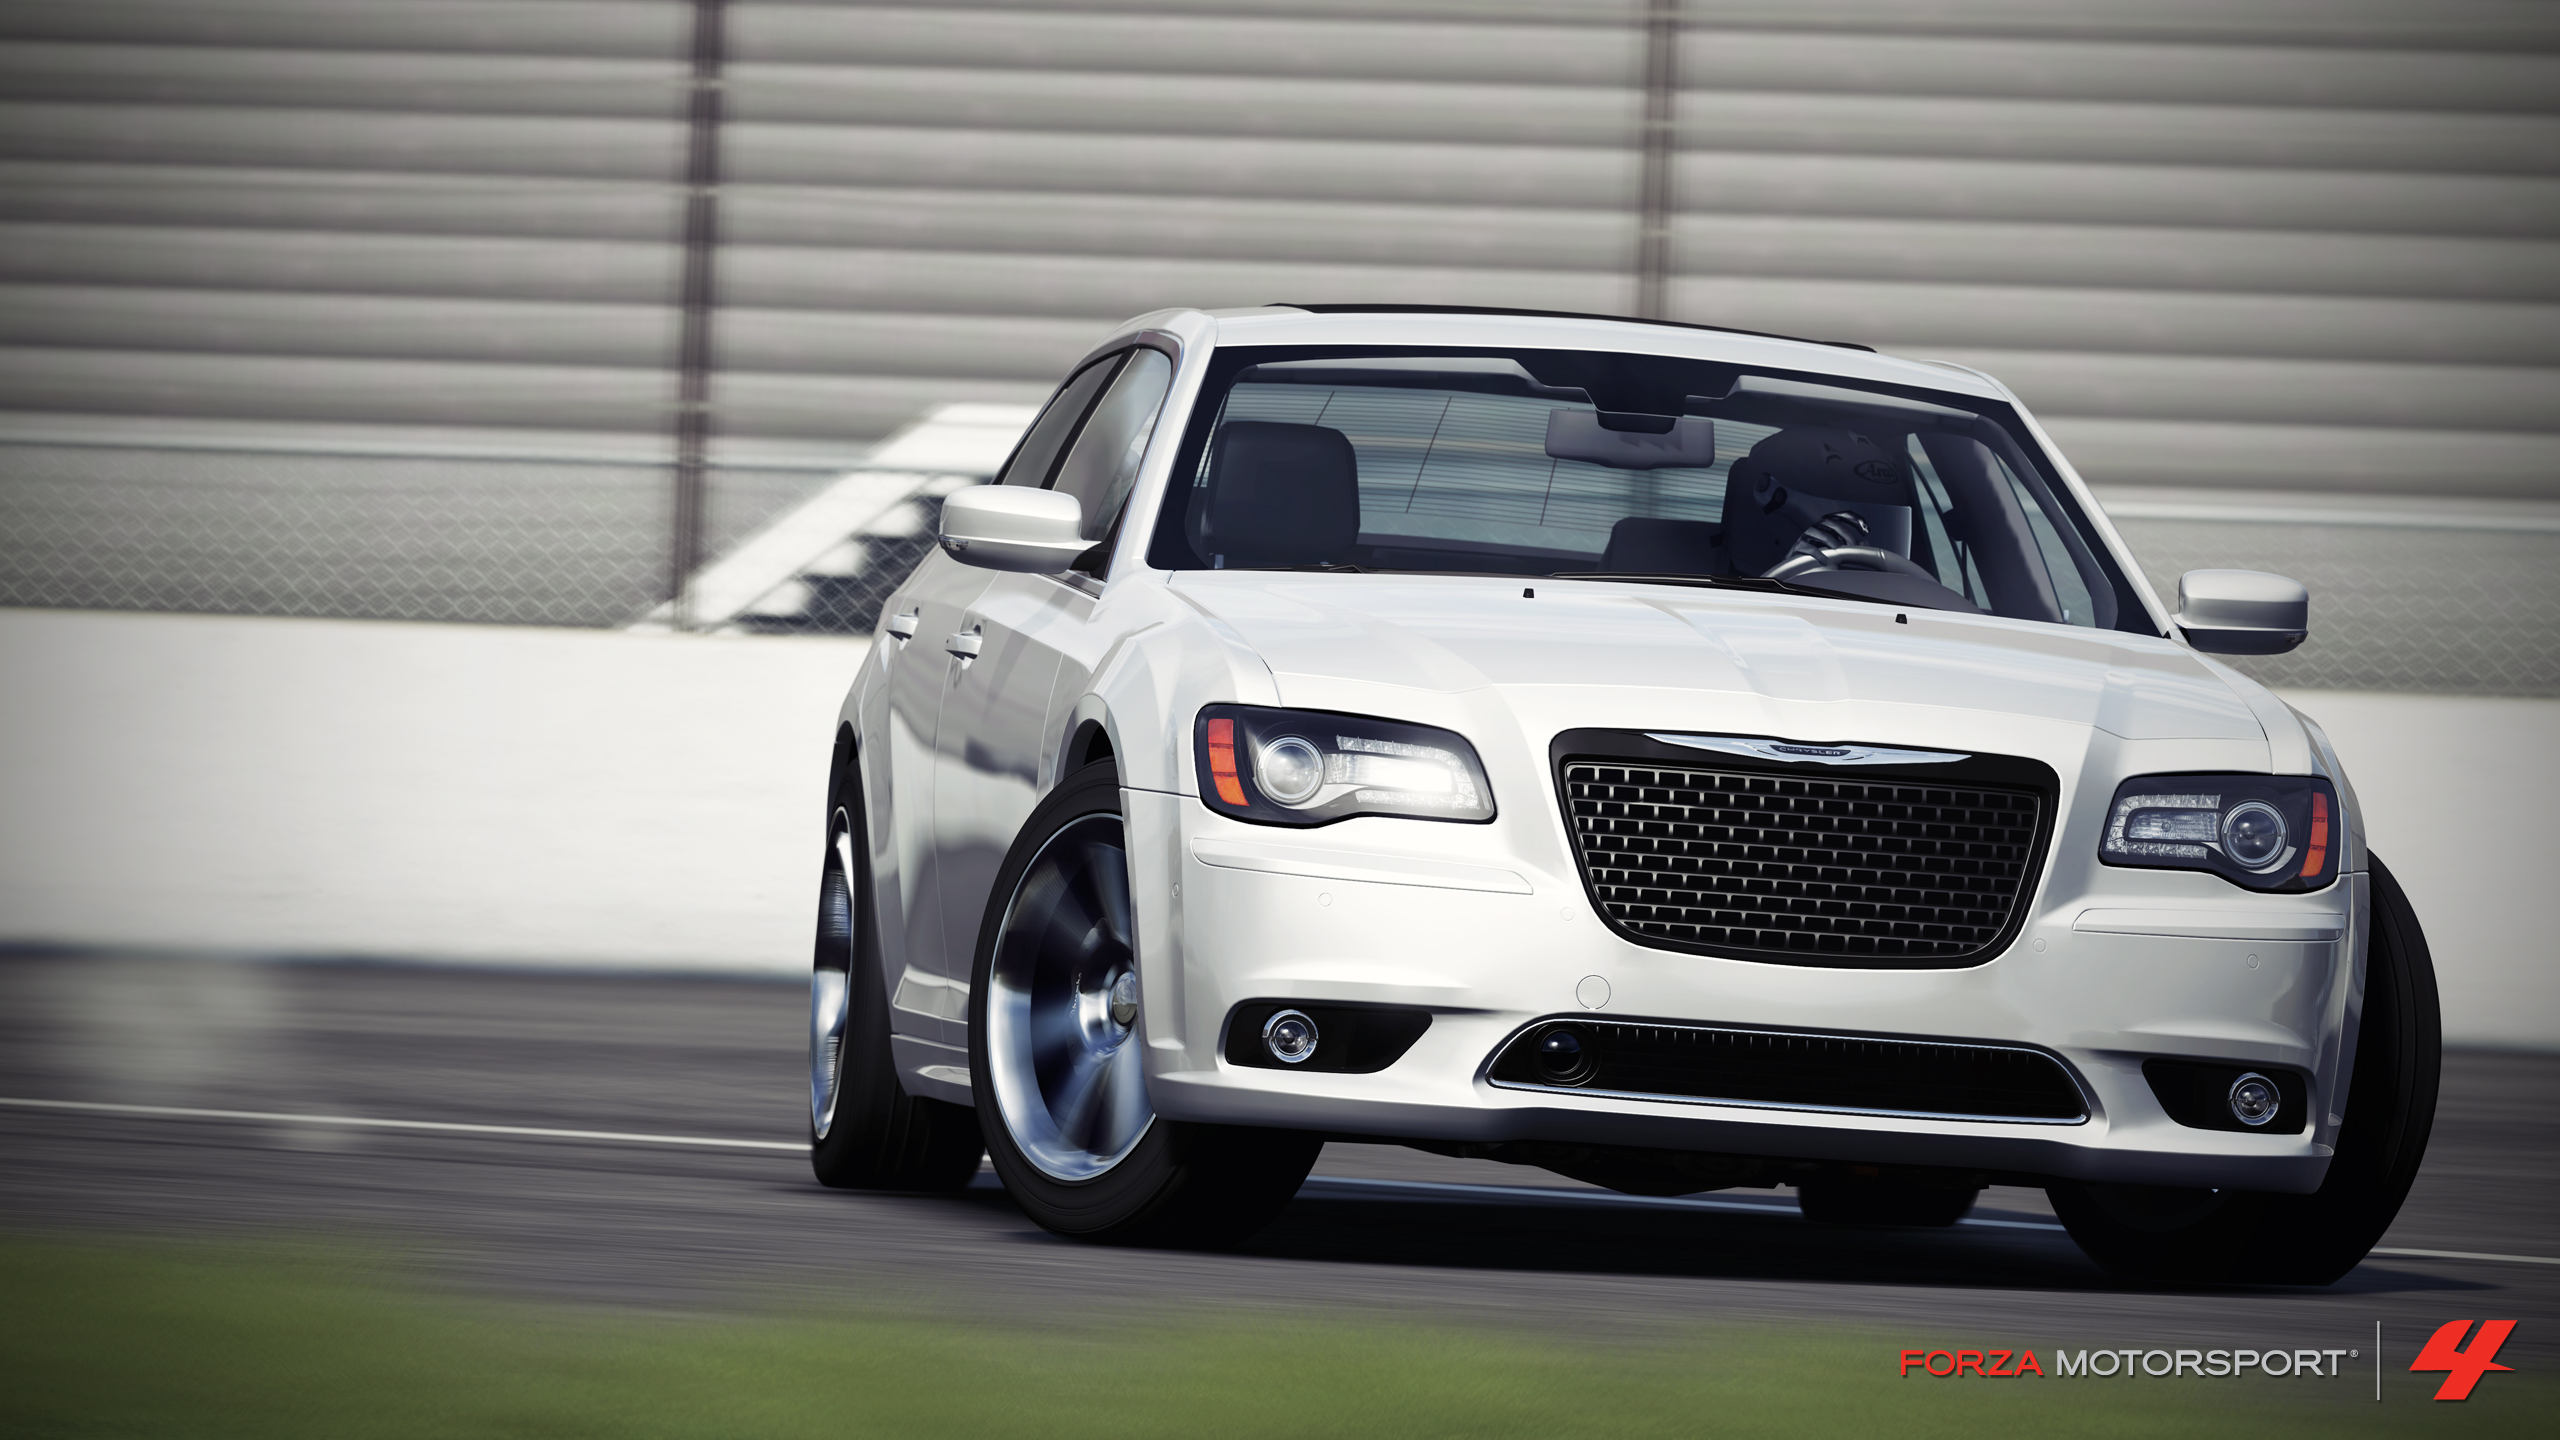 2012 chrysler 300 srt8 3 heyuguys. Cars Review. Best American Auto & Cars Review